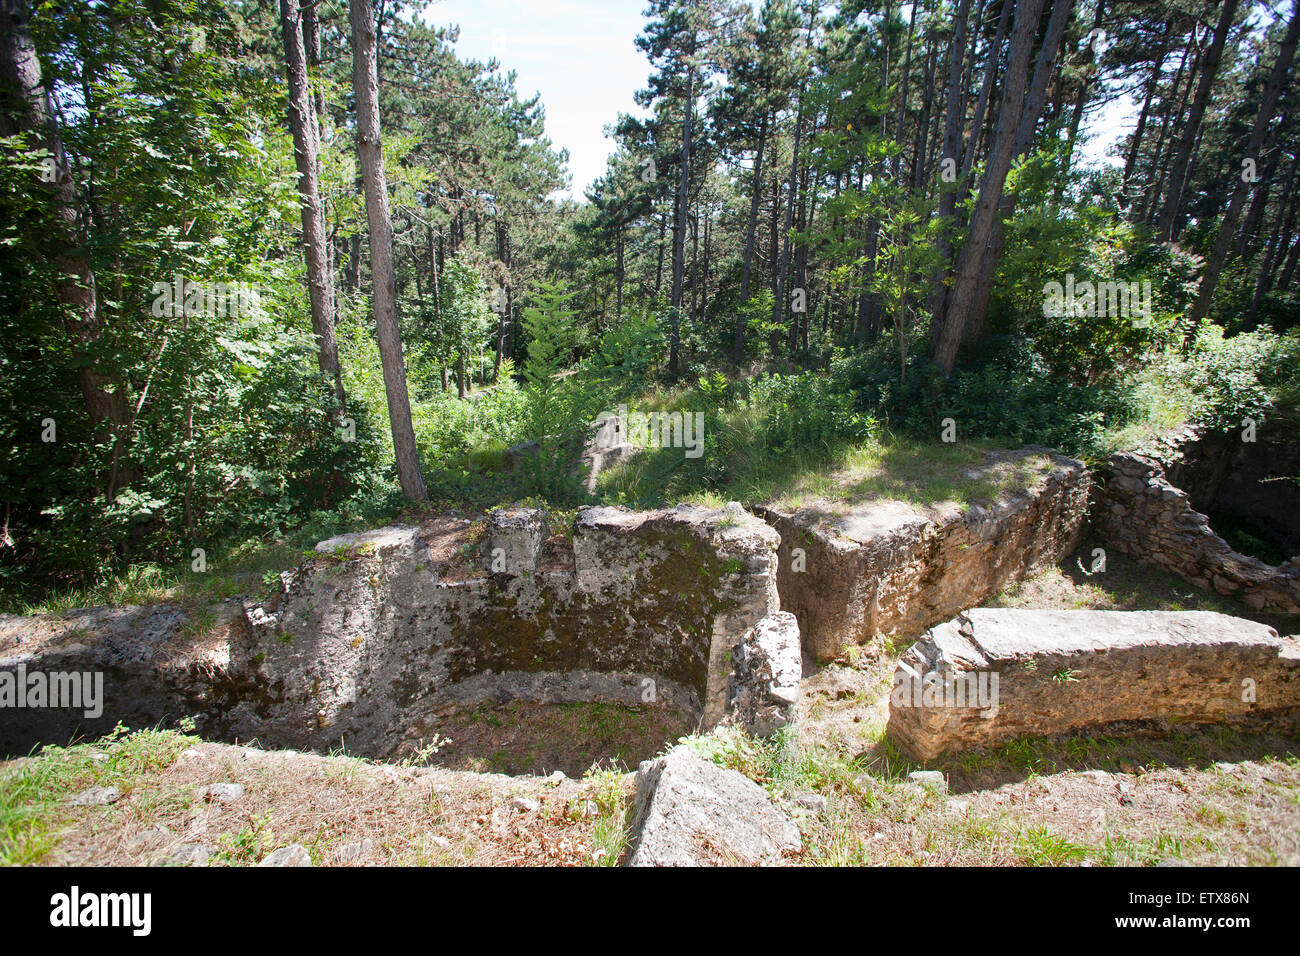 trincea quota 121, carso mountains, monfalcone, province of gorizia, friuli venezia giulia, italy, europe - Stock Image